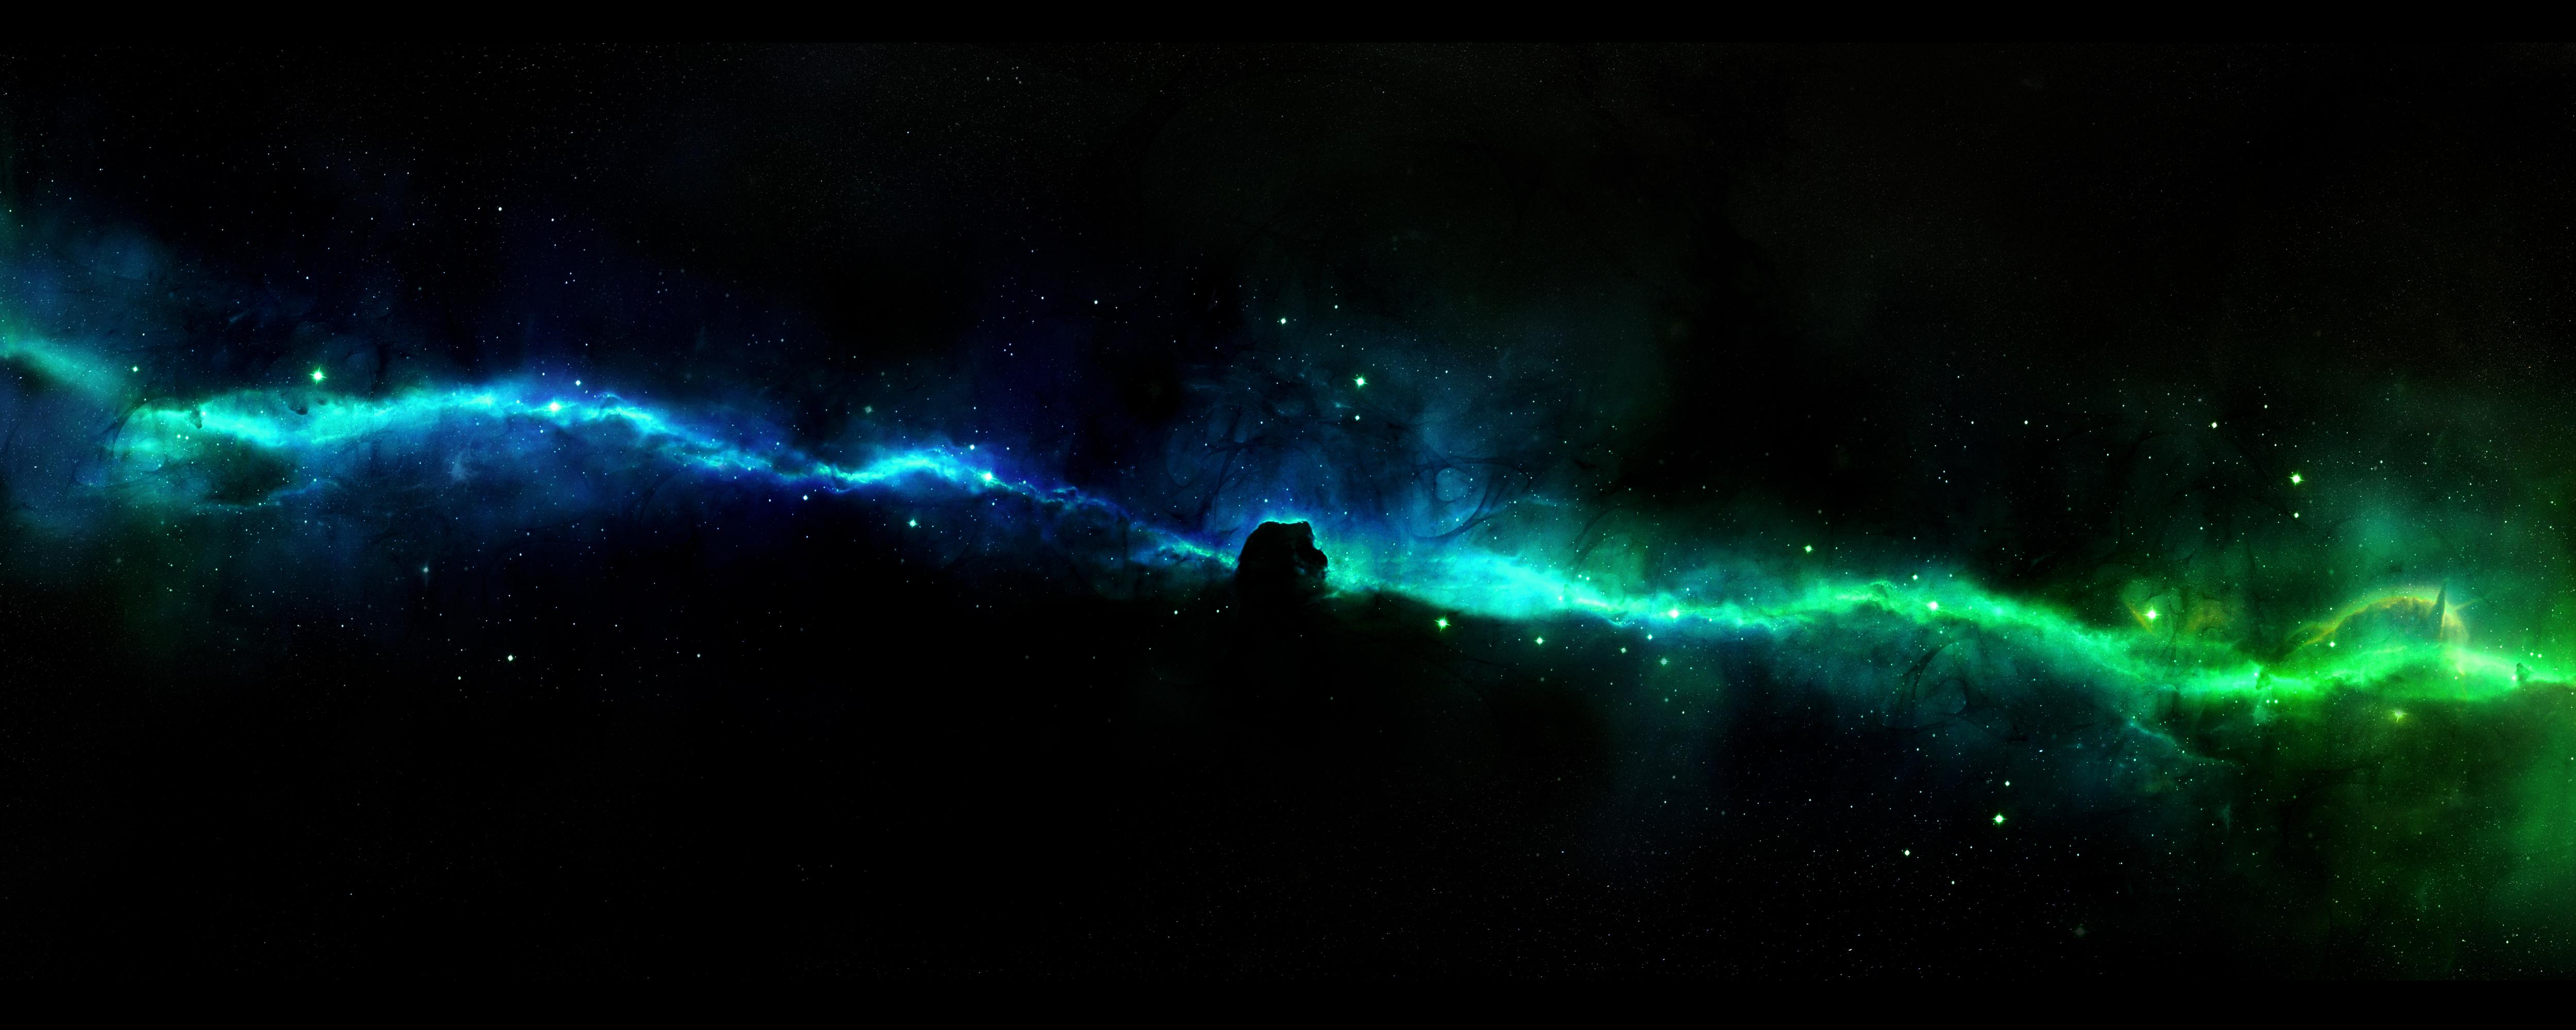 4K wallpaper   Space   space nebula stars deep space   5000x2000 5000x2000